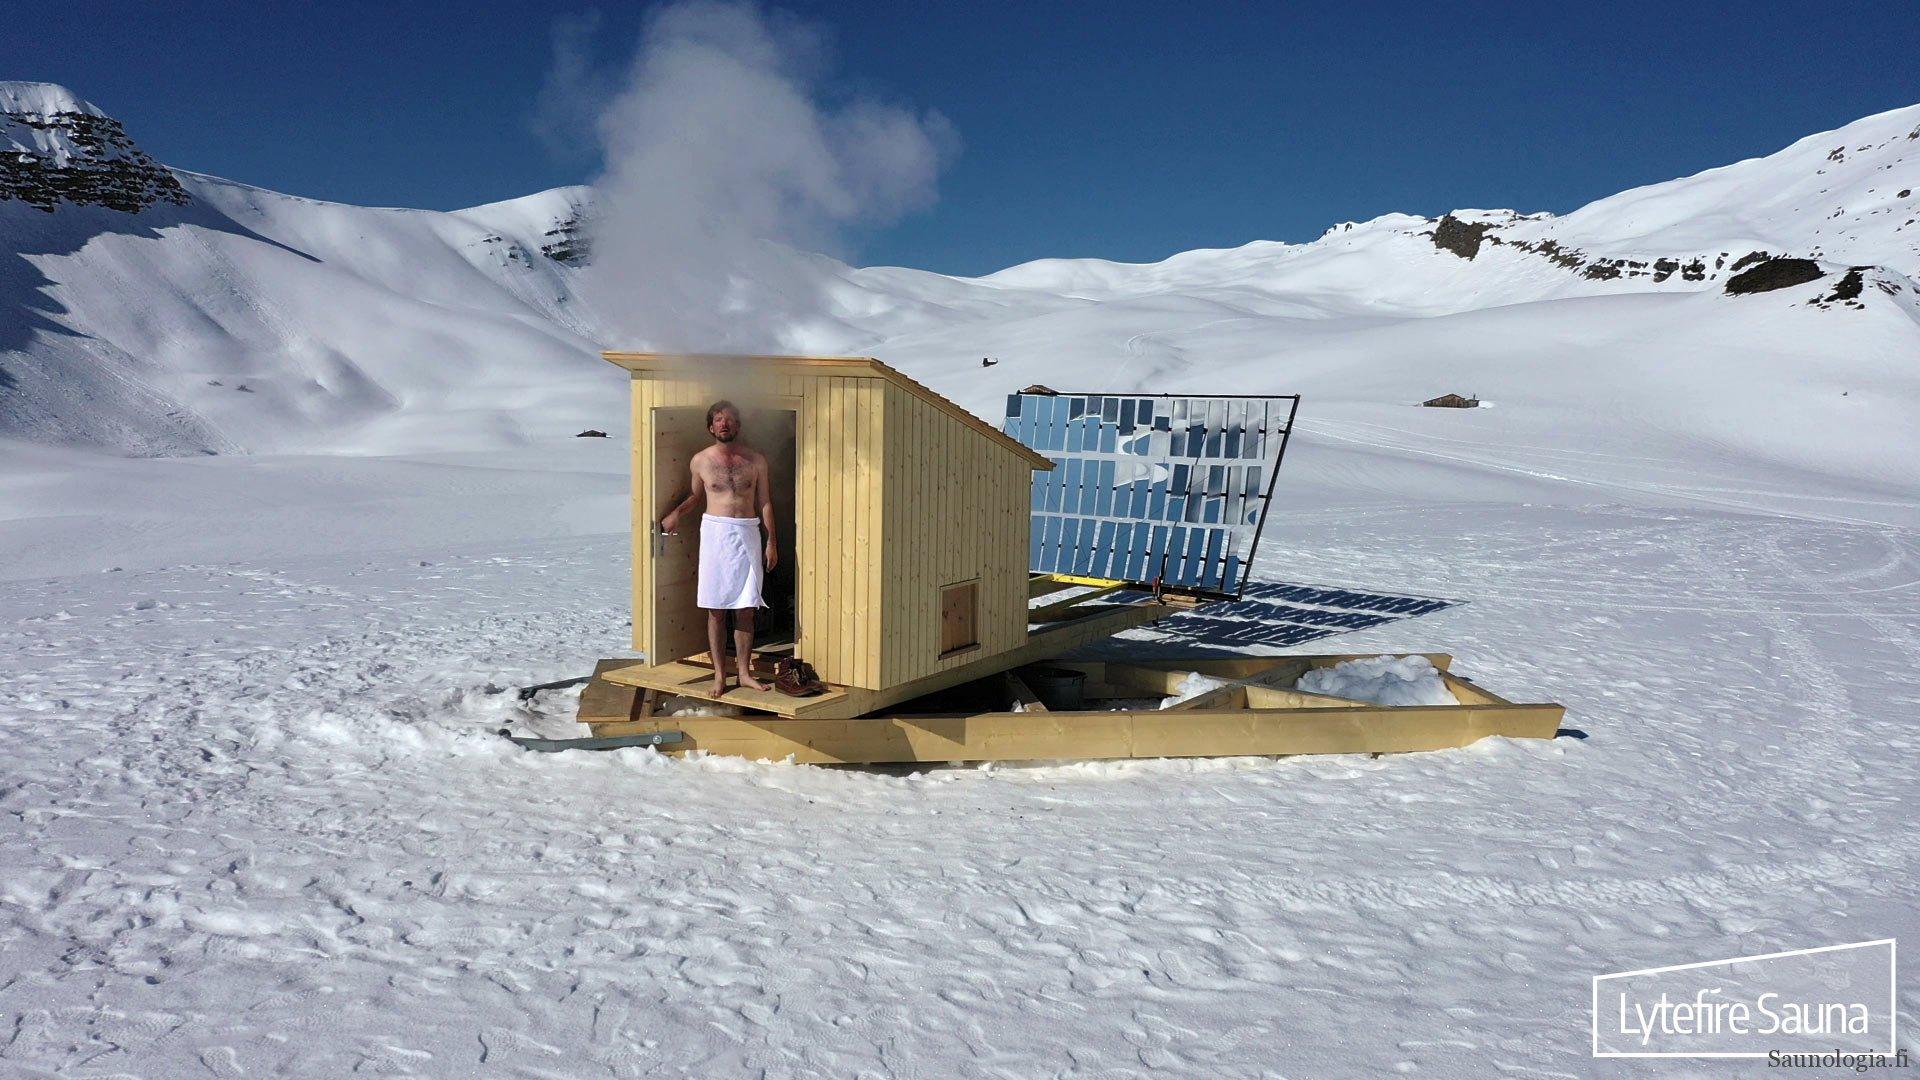 Tiedote: Aurinkosauna Sveitsin Alpeilla